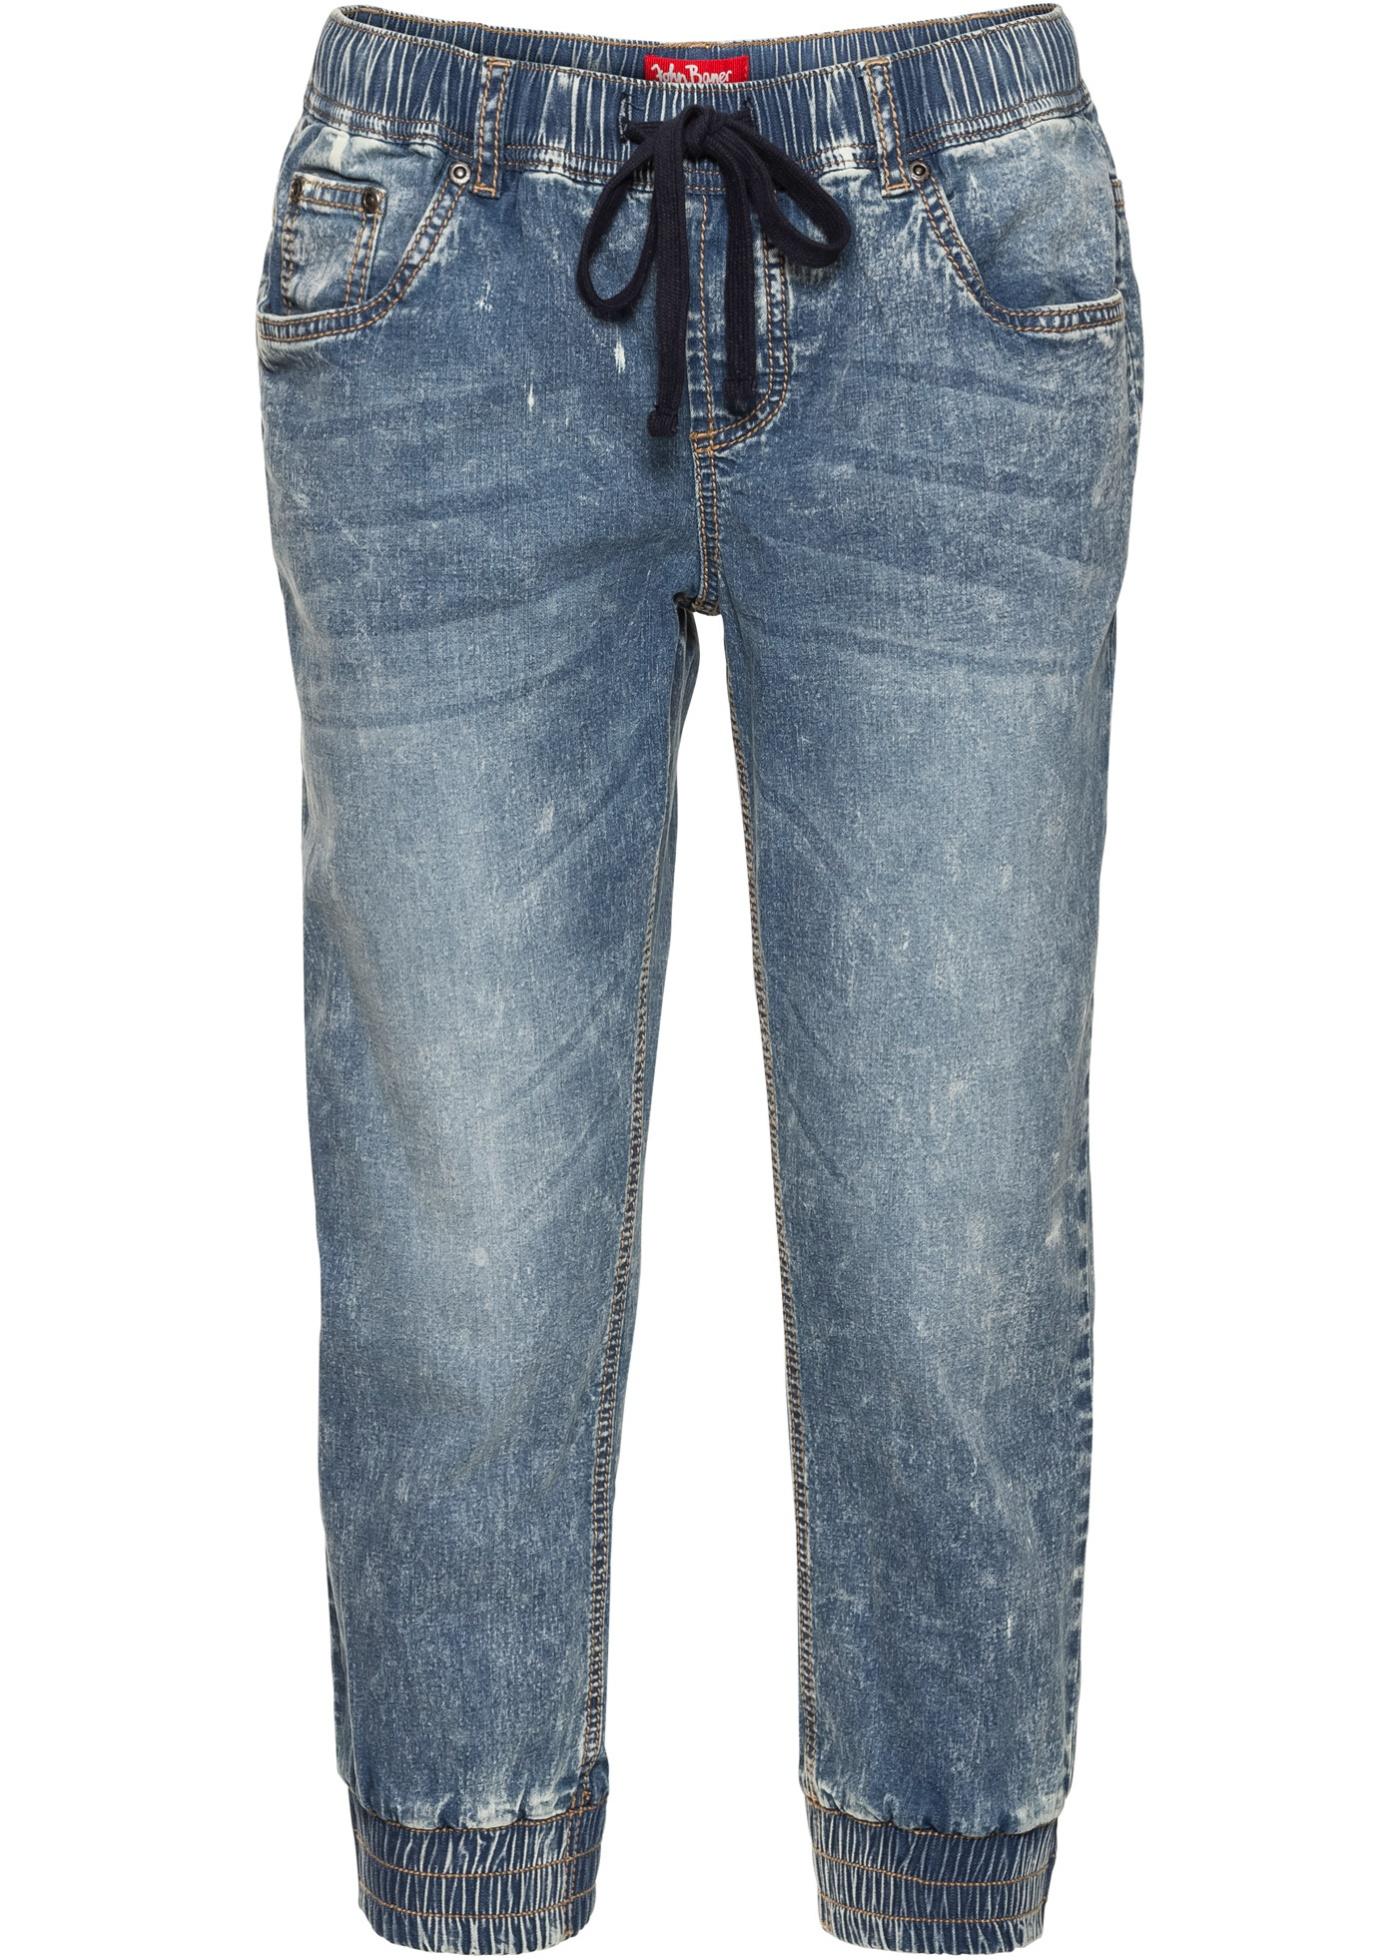 Bonprix - 3/4 jeans 229.00